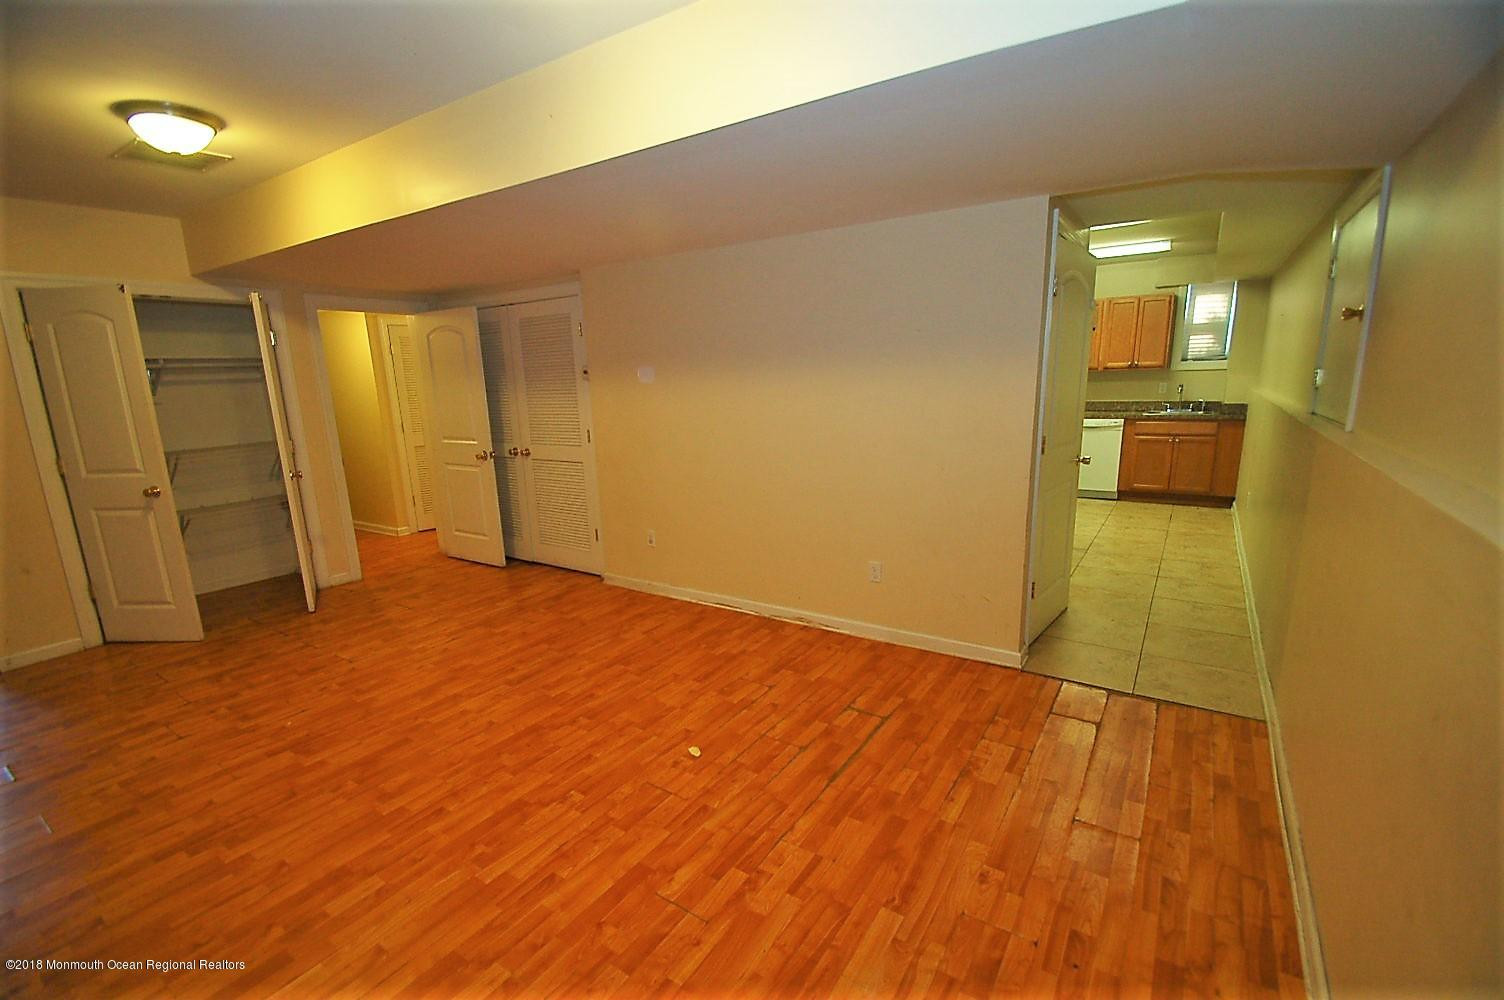 hardwood flooring lakewood nj of 639 7th street lakewood nj 08701 mls 21839104 crossroads realty intended for 639 7th street lakewood nj 08701